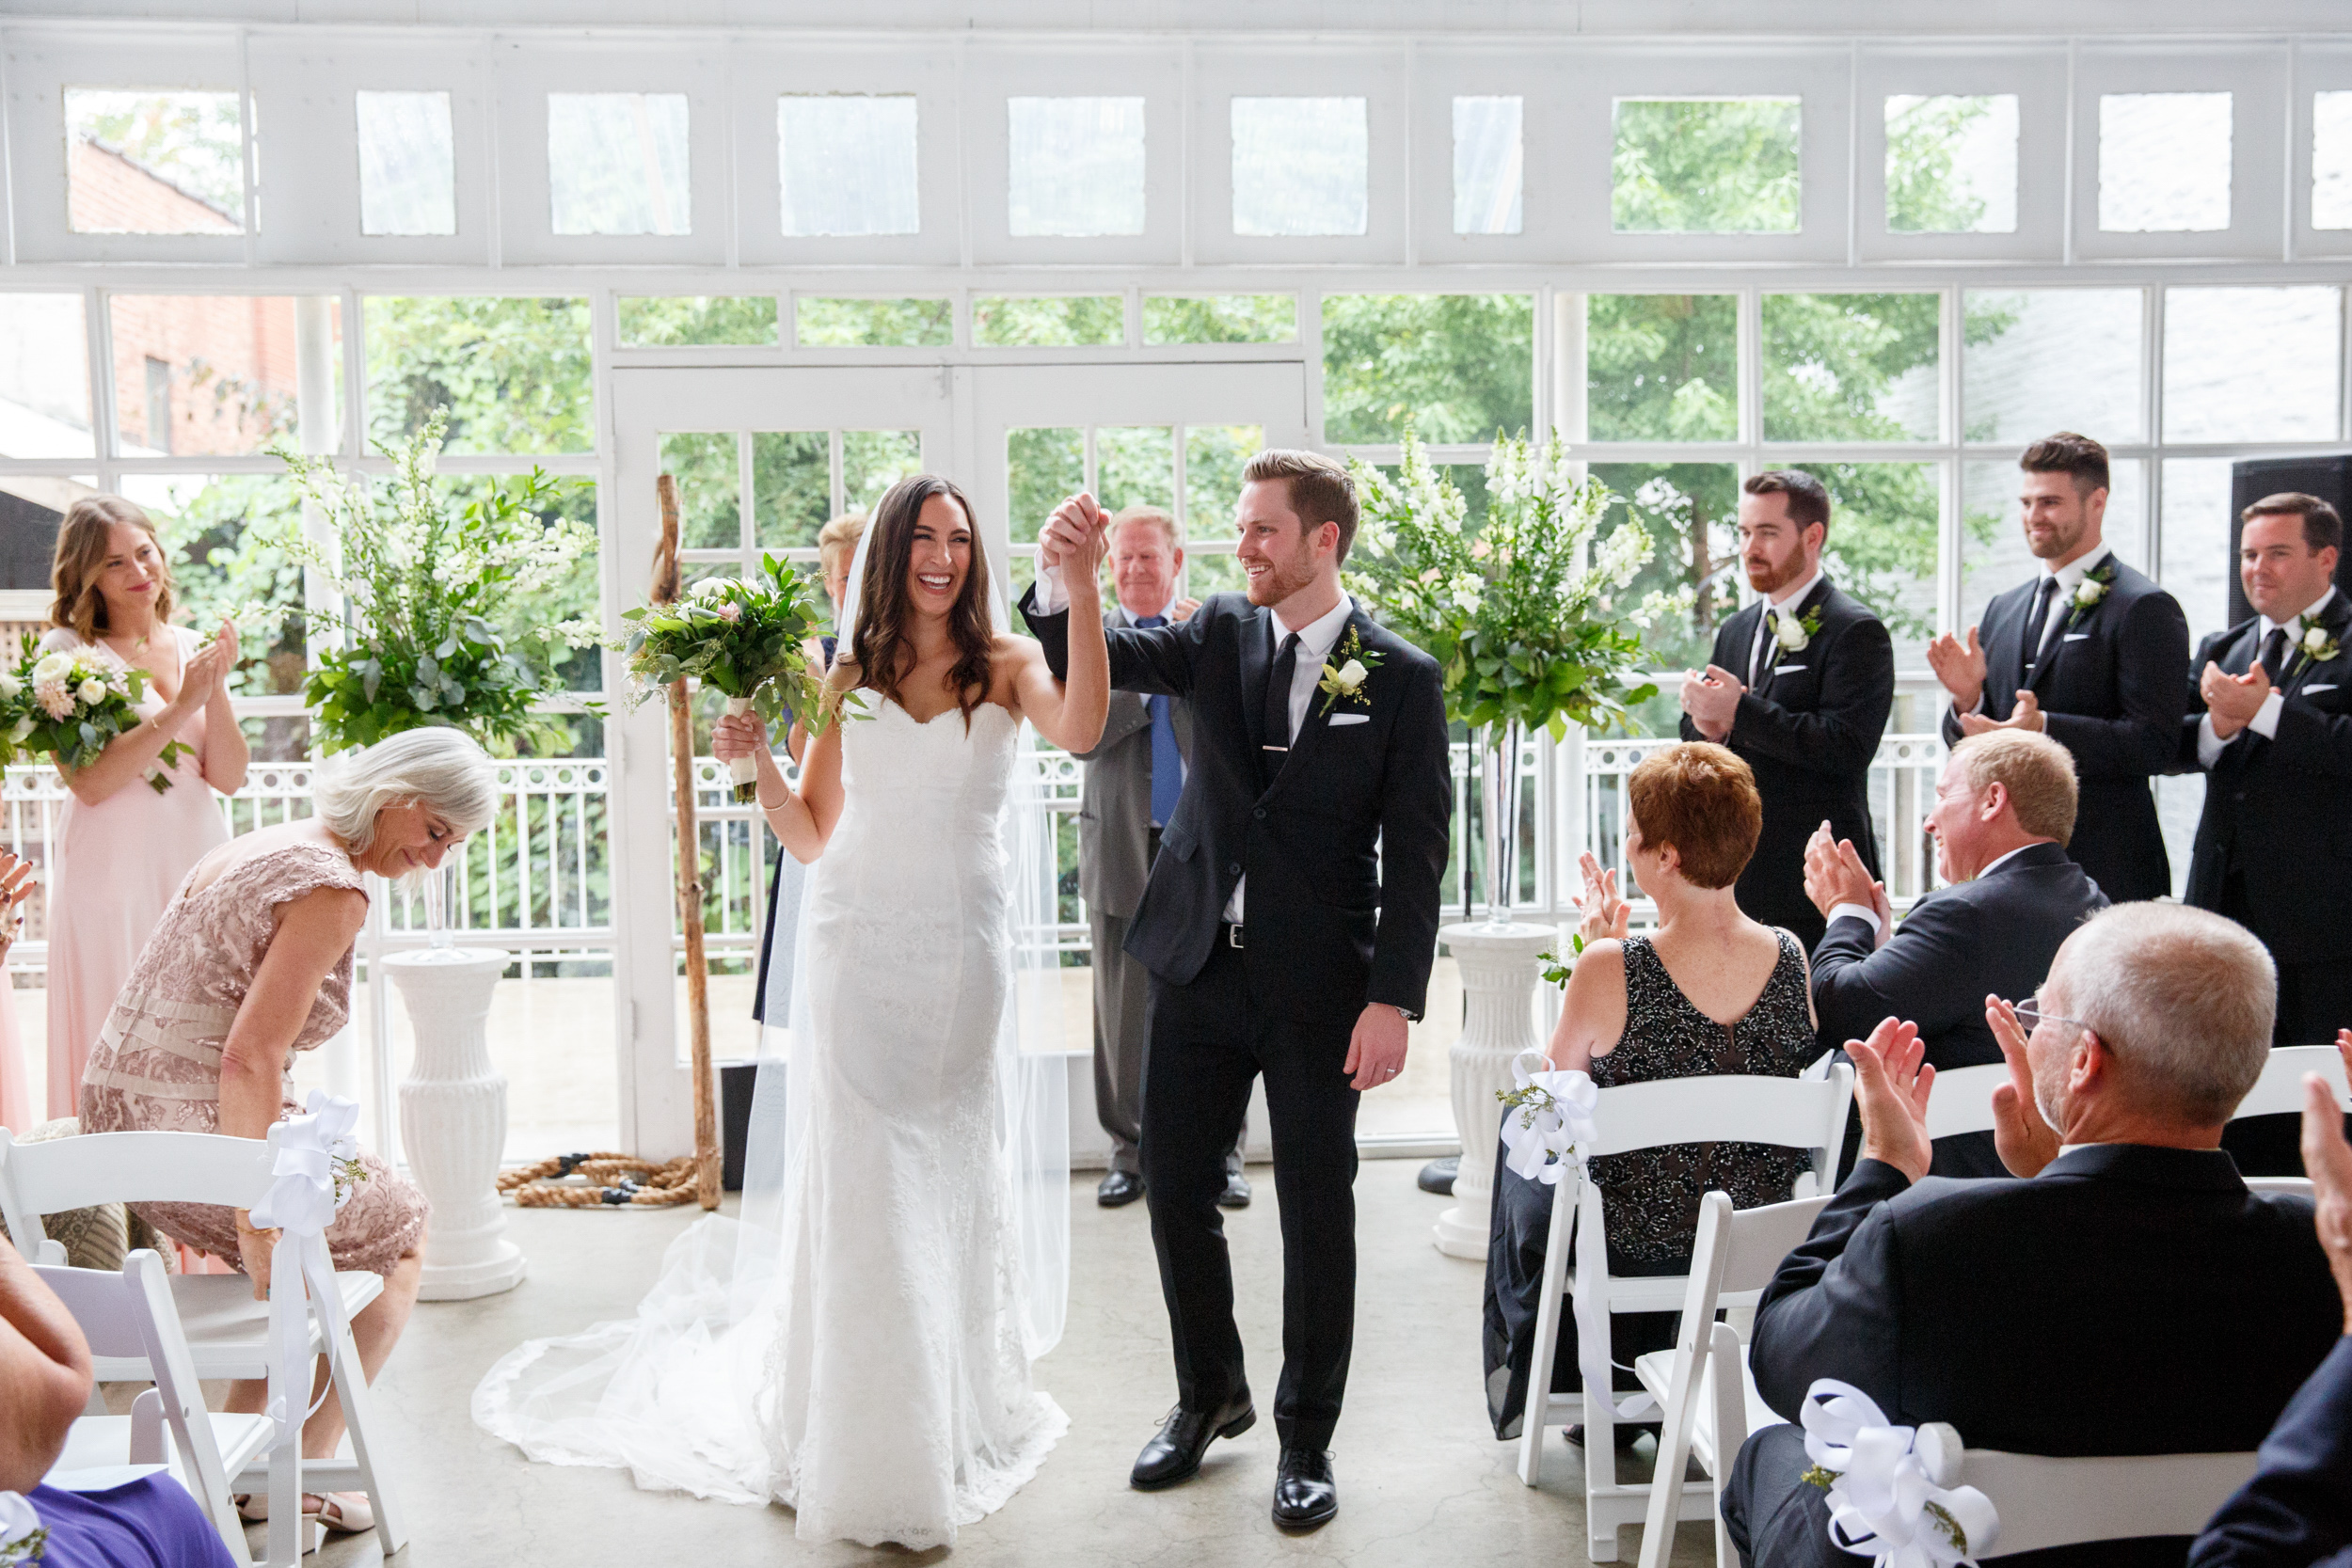 9-09-2016 Flora & Colin wedding photography by Brian Milo-158.jpg